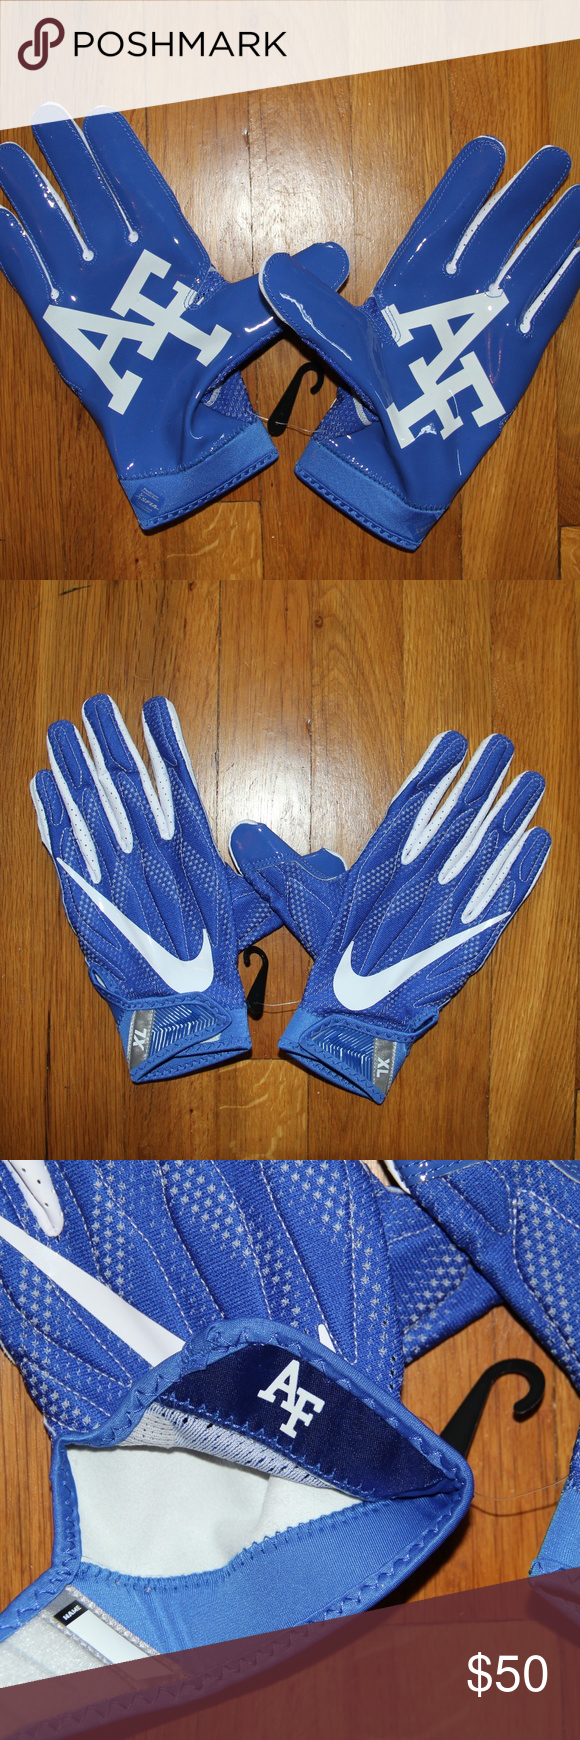 Nike Superbad Air Force Falcons Football Gloves Xl In 2020 Football Gloves Falcons Football Nike